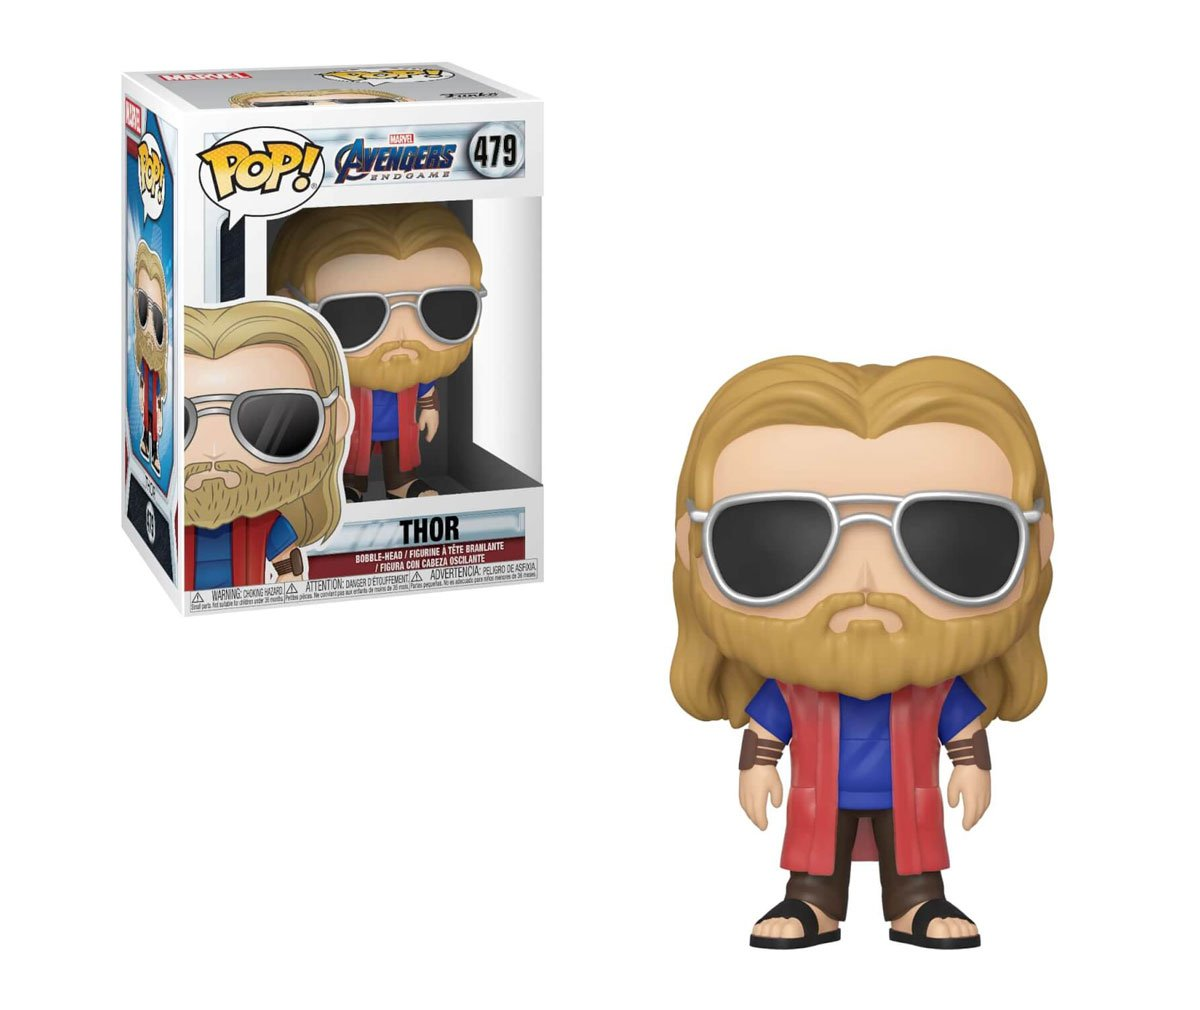 RT & follow @OriginalFunko for a chance to WIN an #AvengersEndgame Thor Pop! #FunkoAvengers #Thor